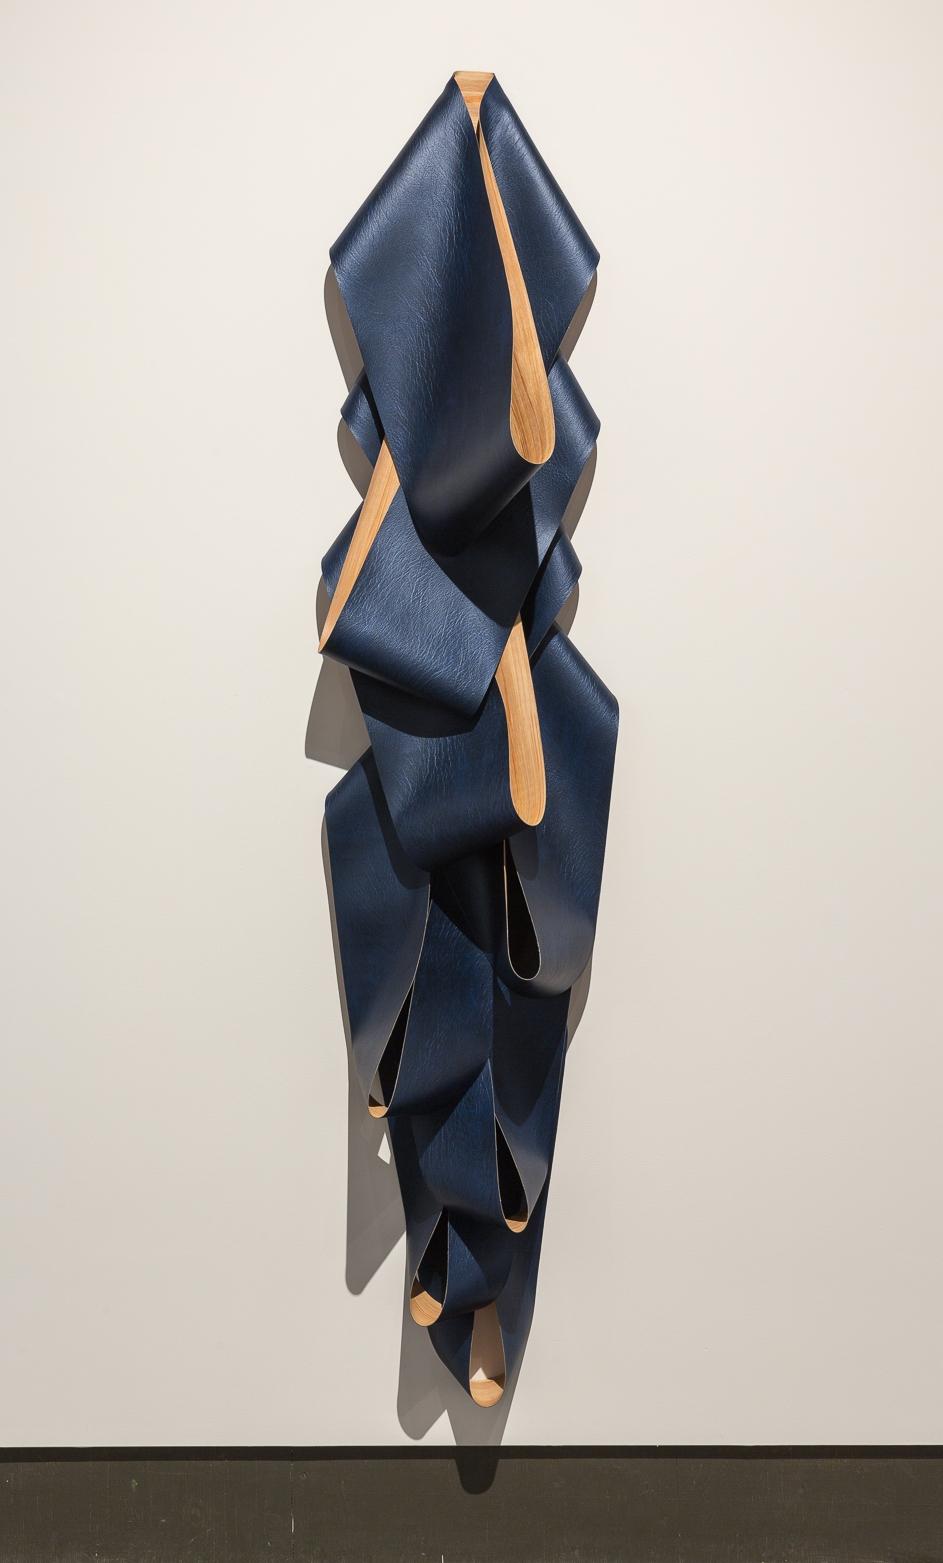 Blue Double Buck , 2015, acrylic on sliced faux leather vinyl. Photo: © Scott Lee